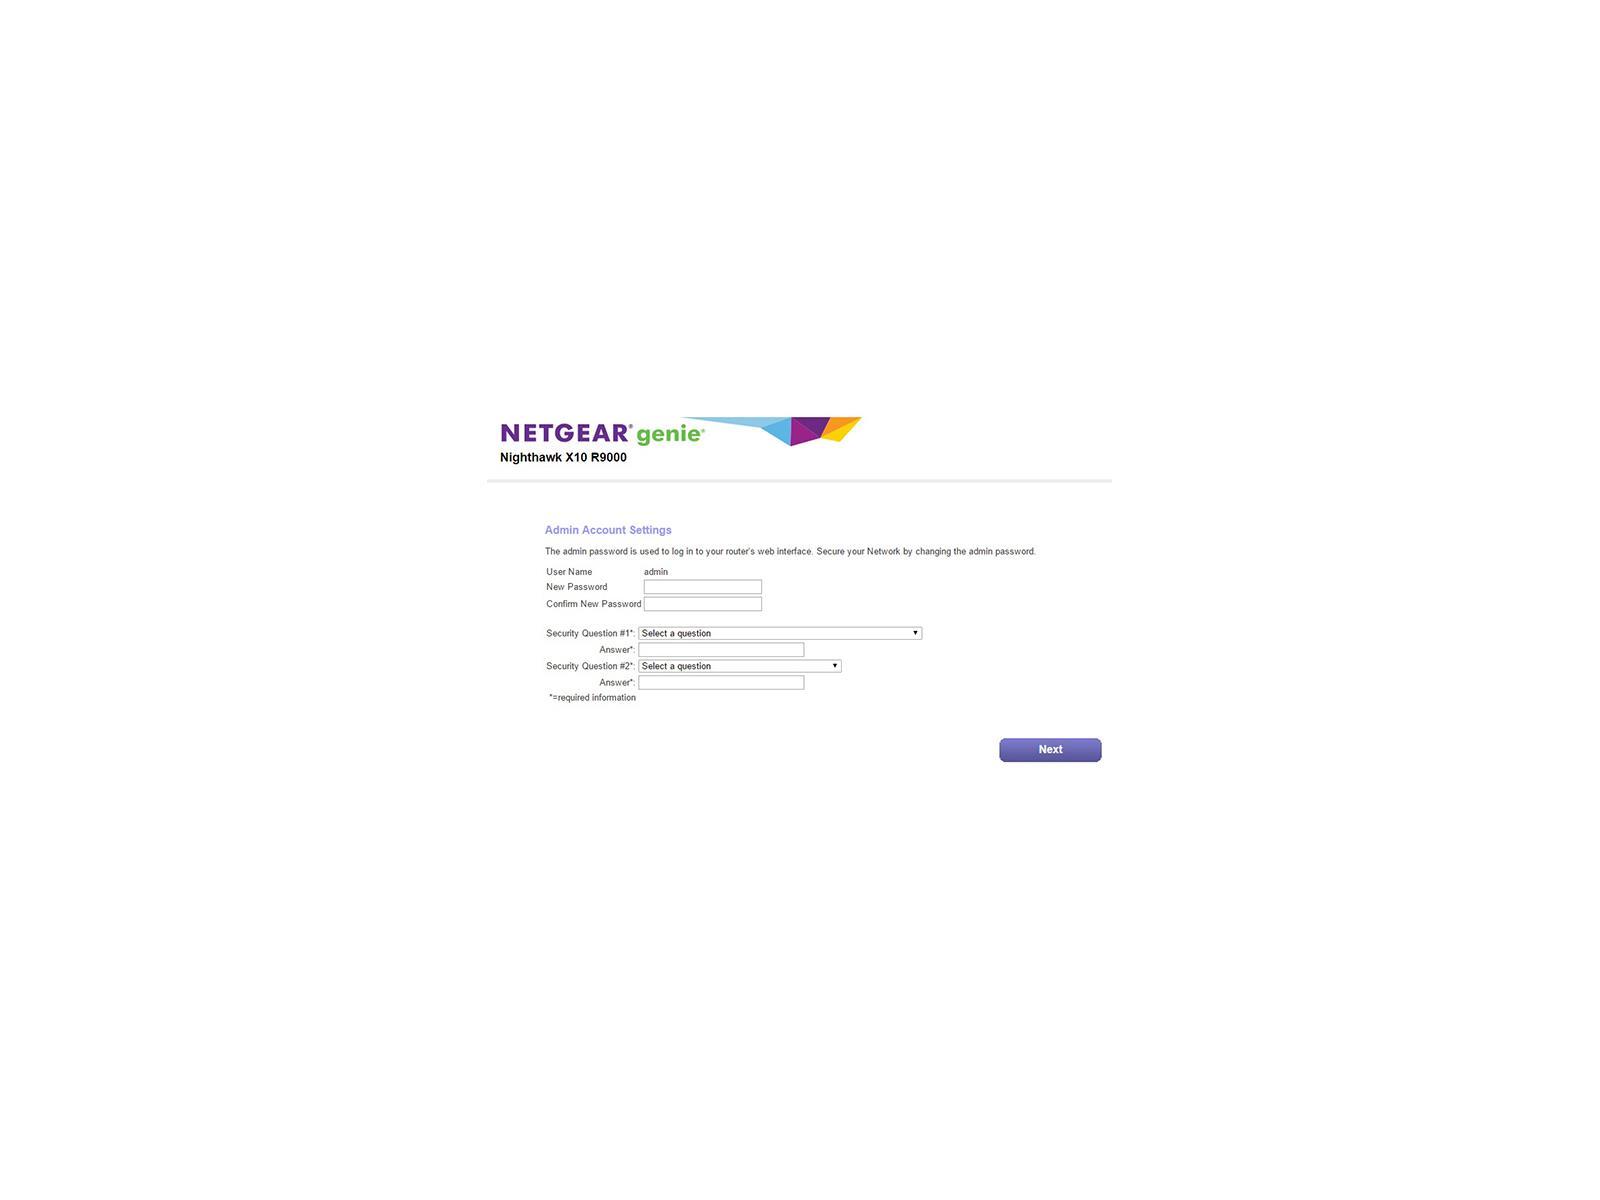 Netgear Nighthawk X10 Wireless AD7200 Router Review [Updated